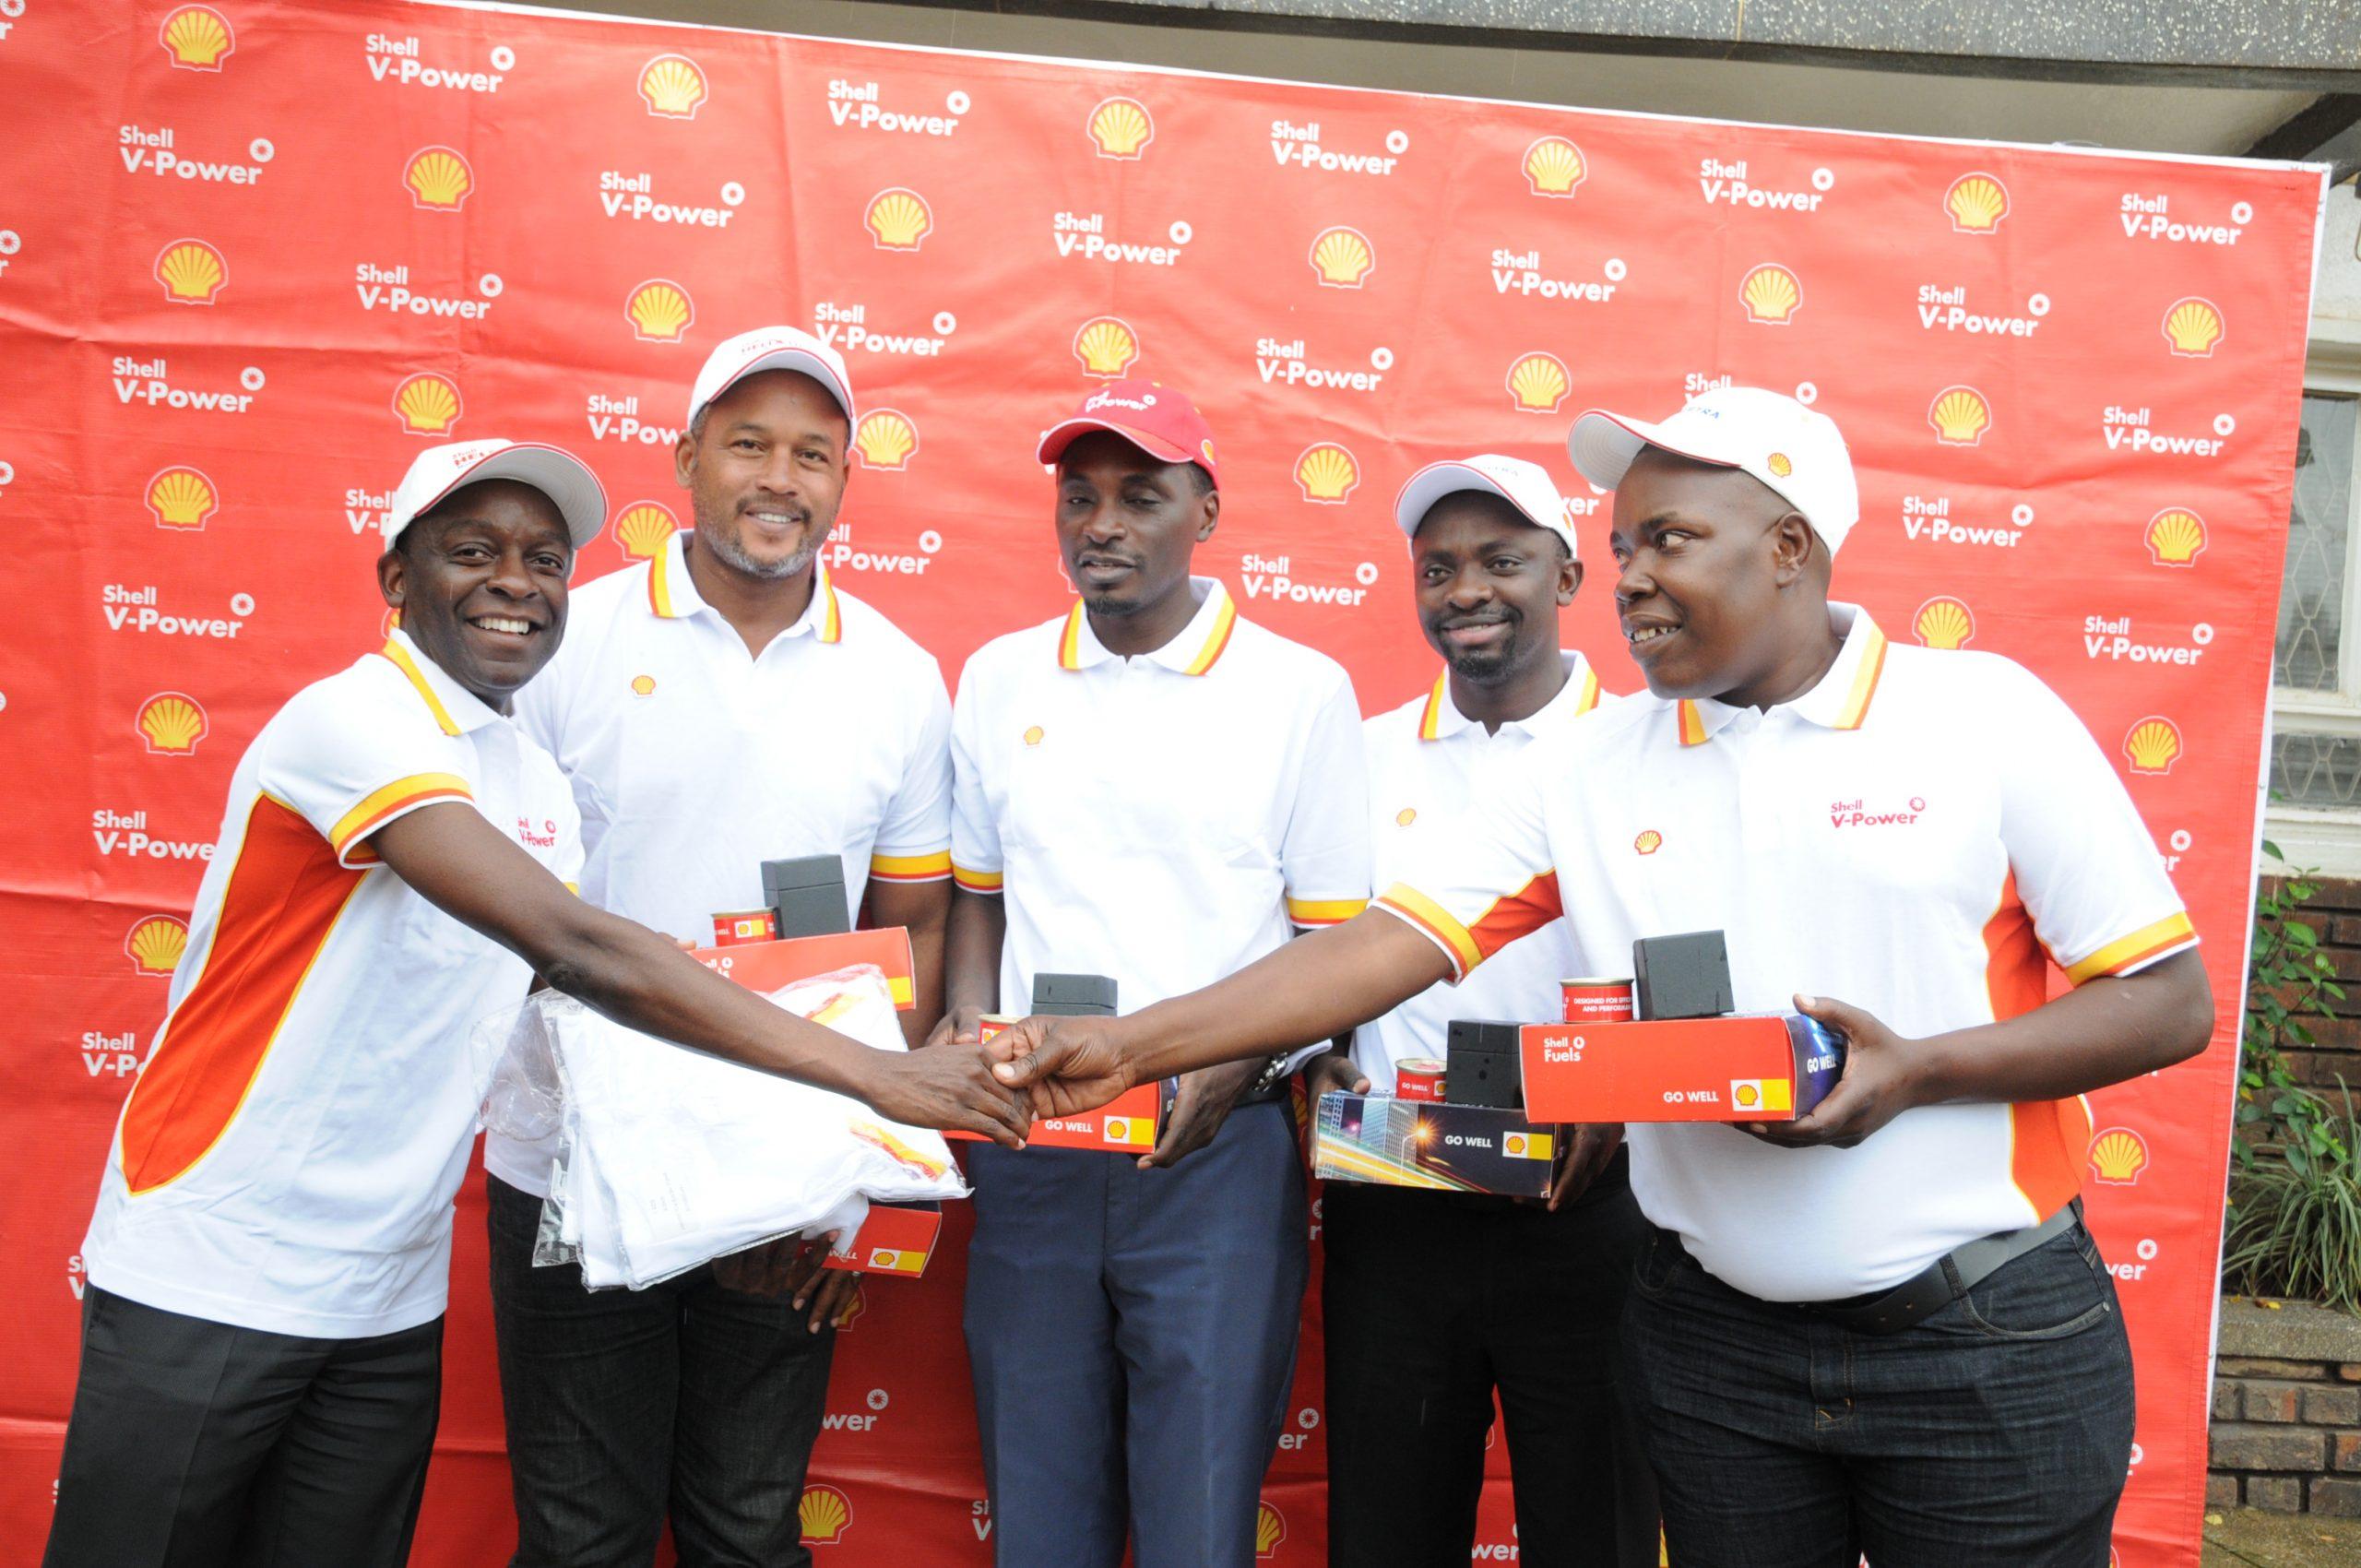 Vivo Energy Marketing Manager Moses Kebba hands over fuel vouchers and goodies to Shell rally drivers Arthur Blick, Omar Mayanja, Umar Kakyama and Ronald Sebuguzi.